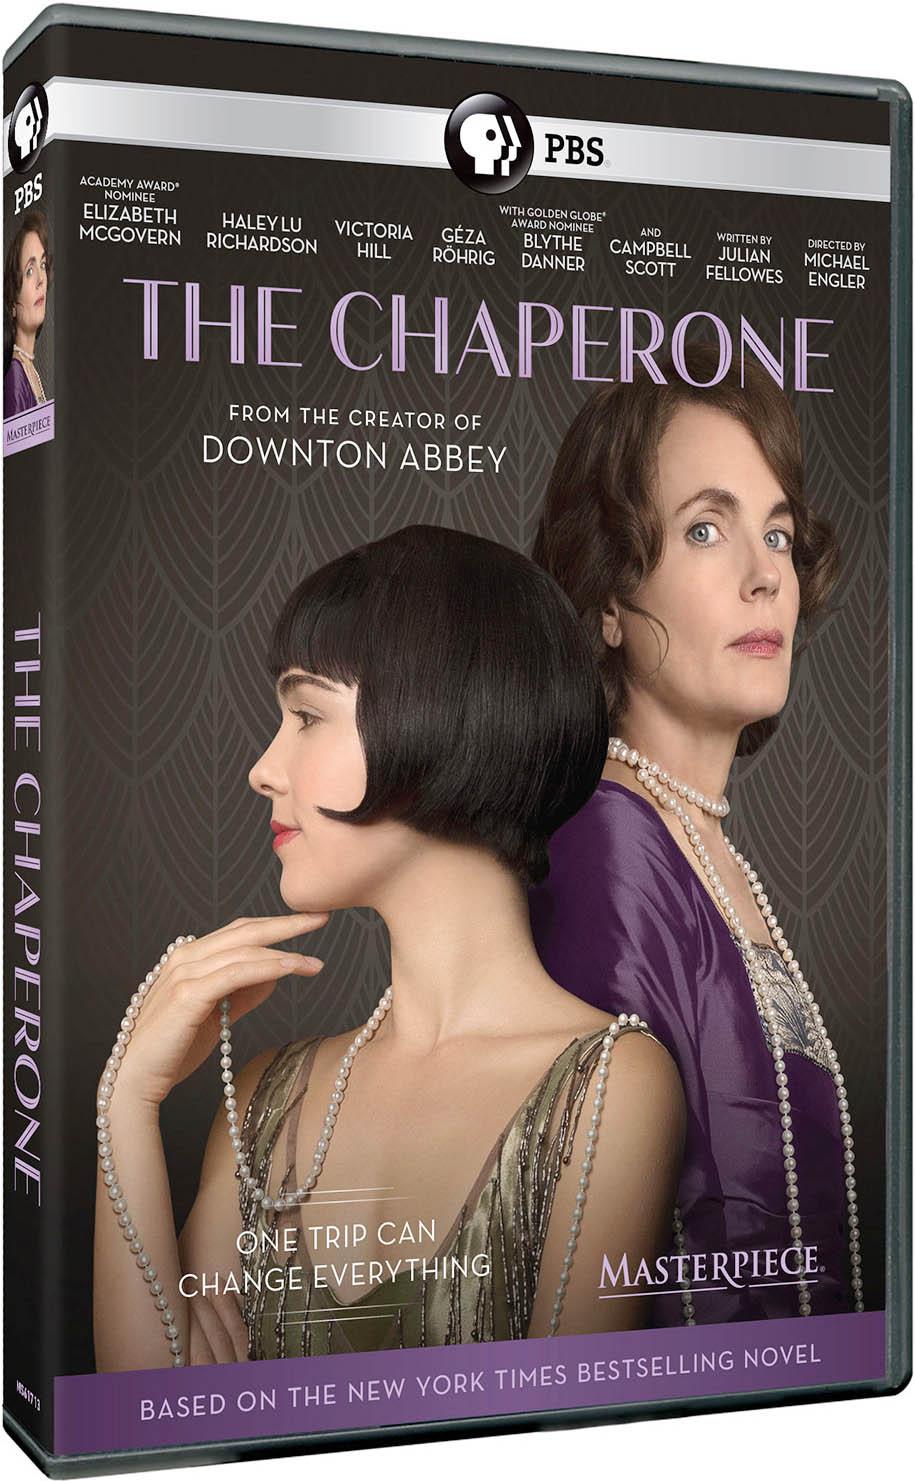 TheChaperone-dvd-cov